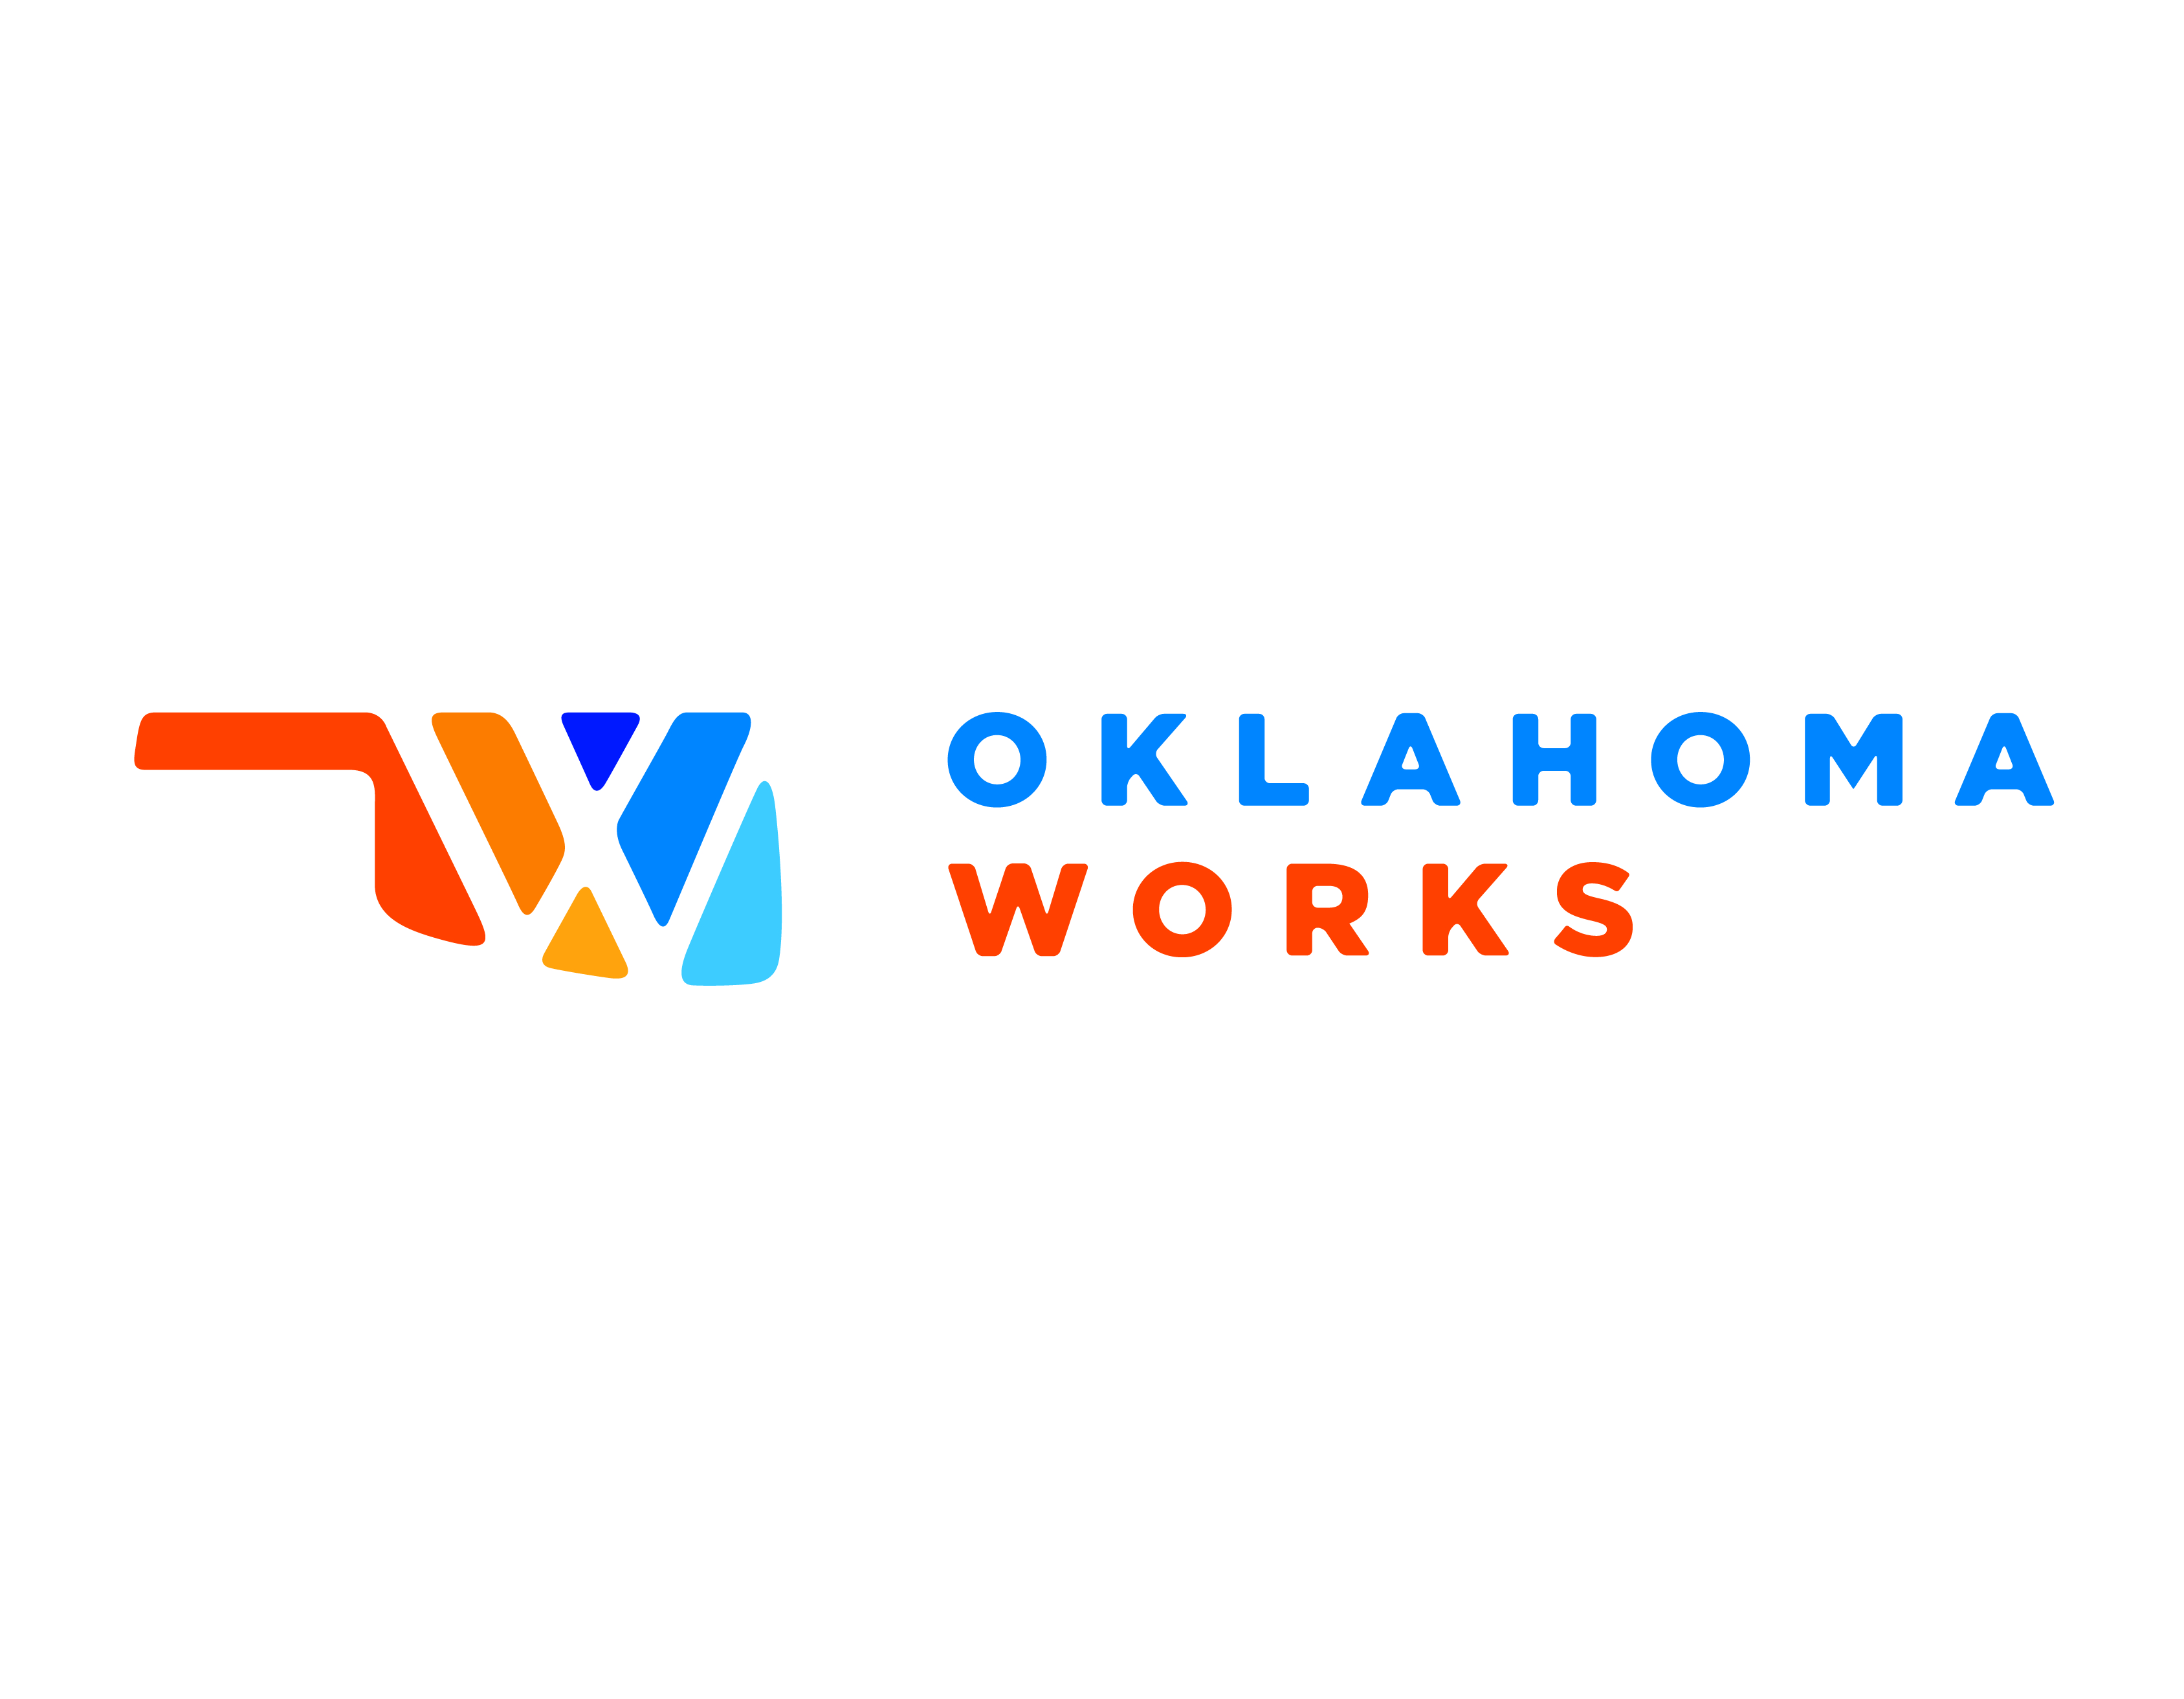 oklahoma-works-logo-horizontal-cmyk-01-01